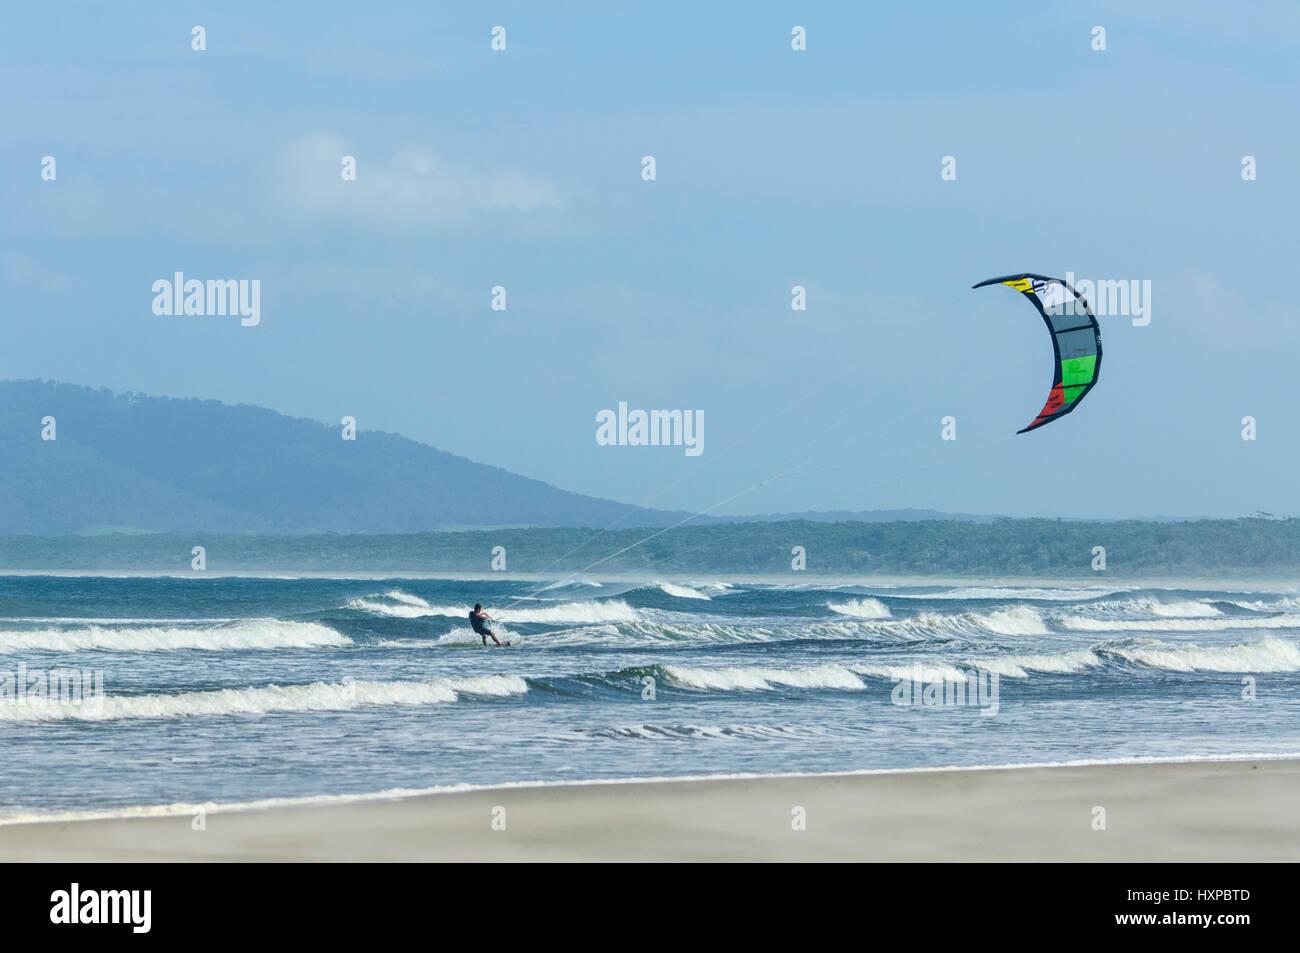 Kite surfer surfing among large waves at Seven Mile Beach, Gerroa, Illawarra Coast, New South Wales, NSW, Australia - Stock Image